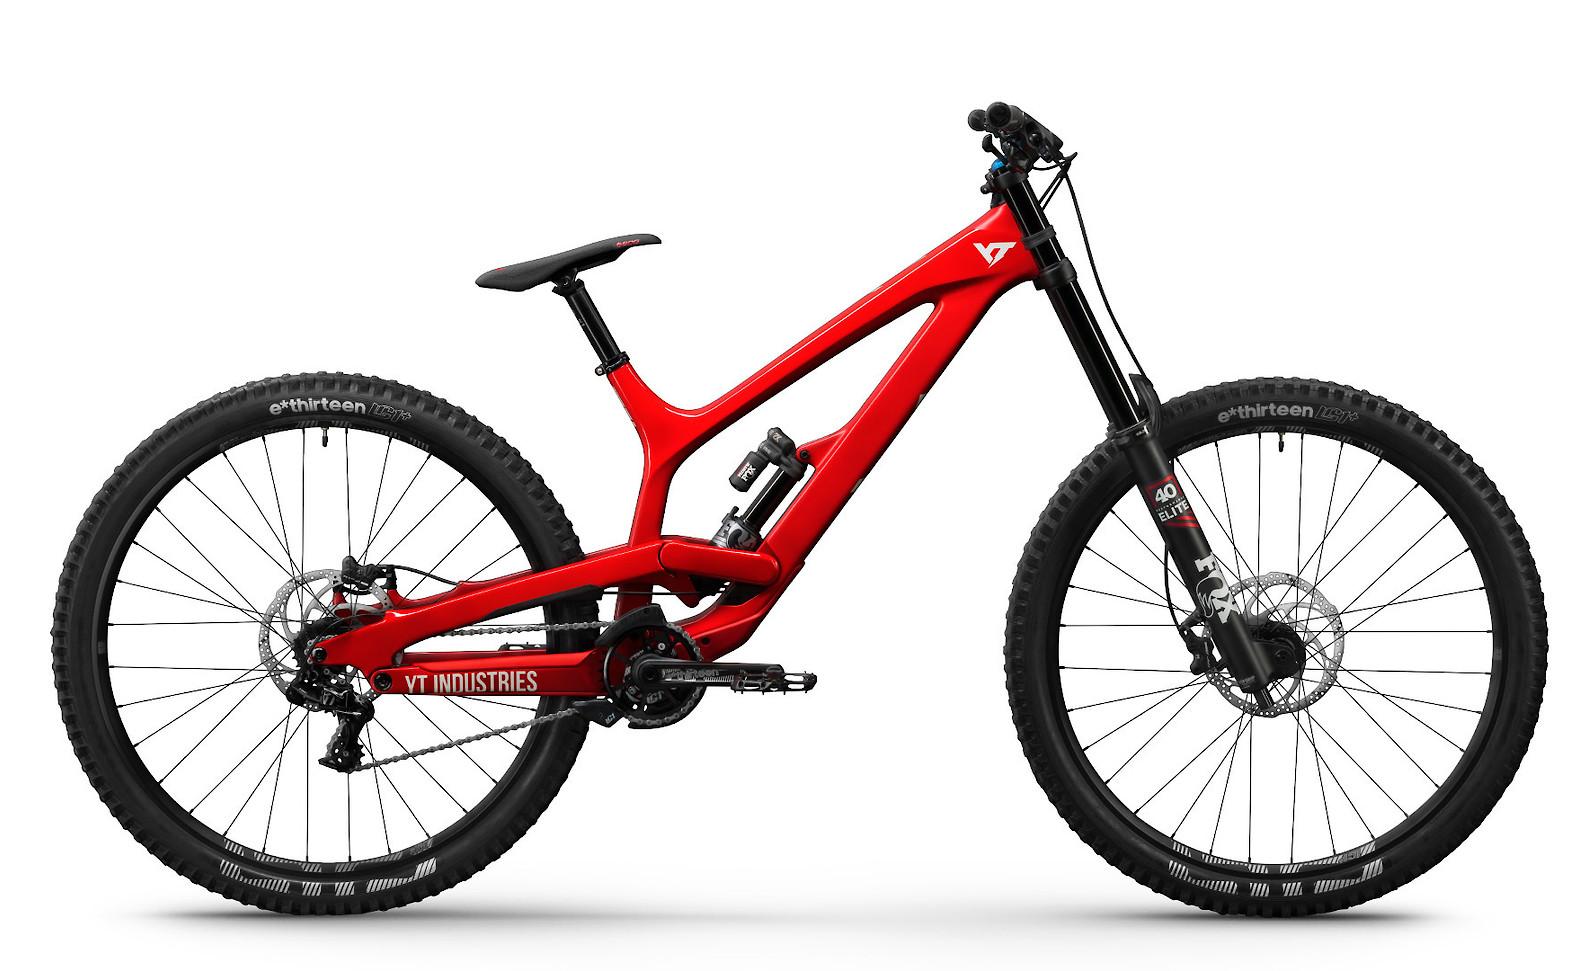 2019 YT Tues 29 CF Pro Bike